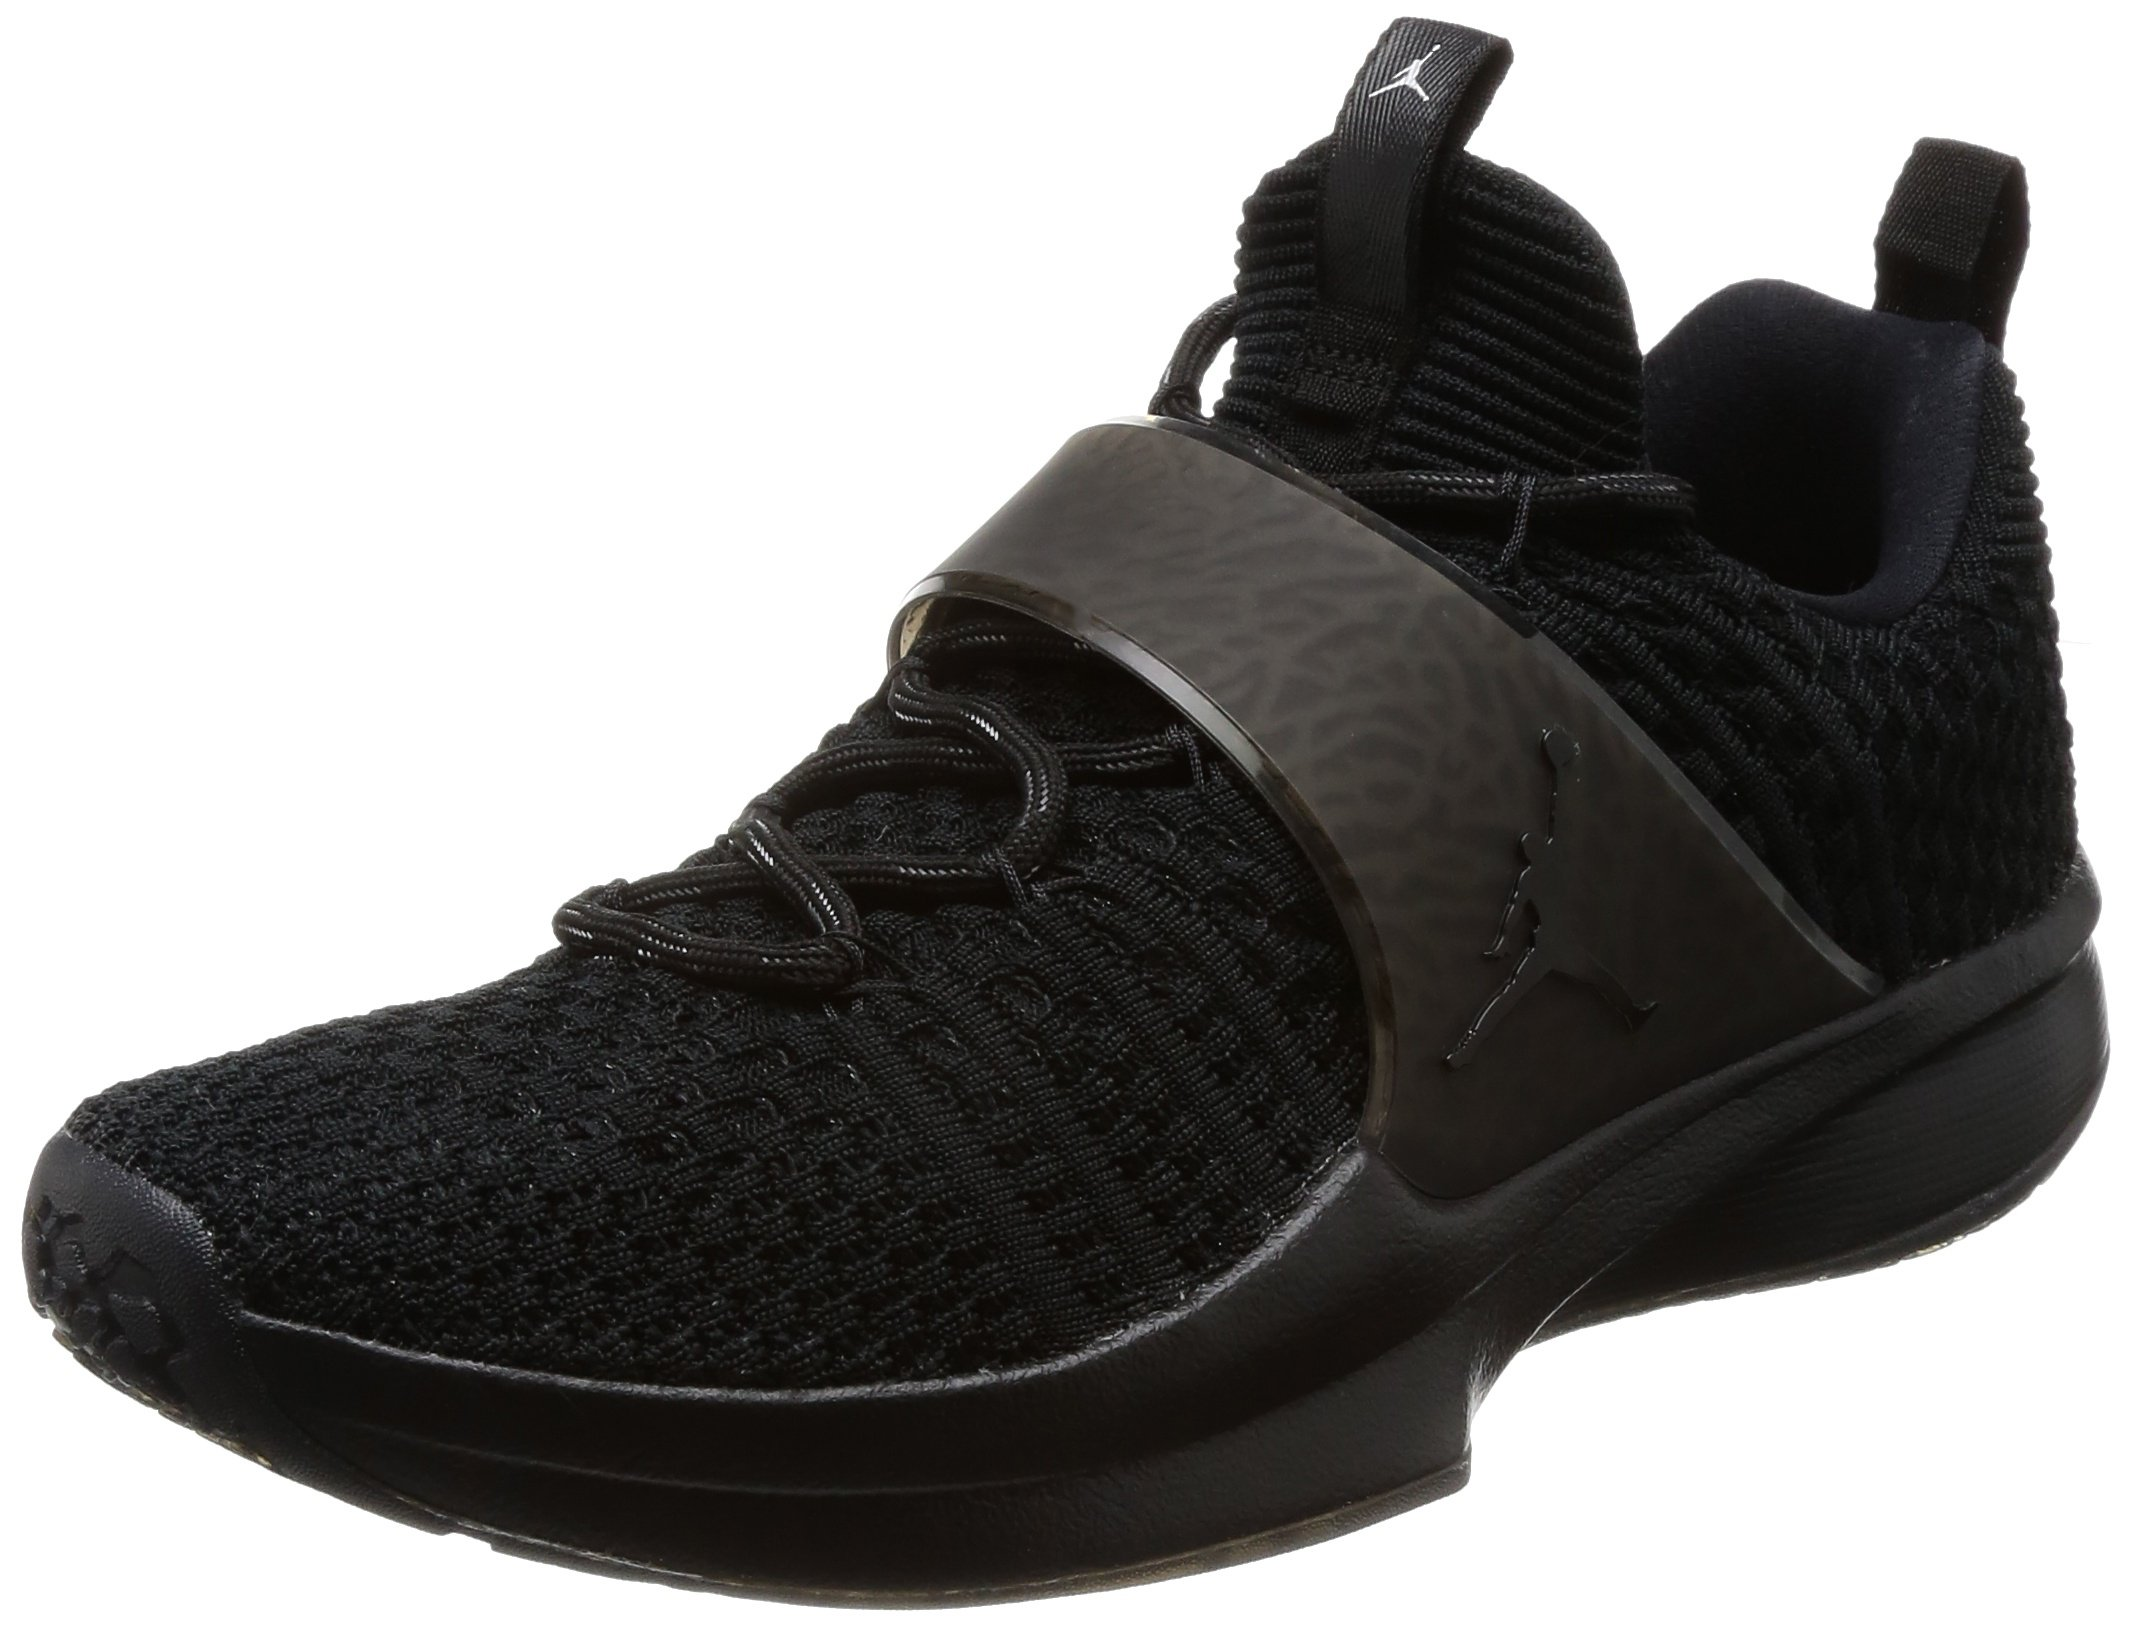 Nike jordan  flyknit, - trainer 2 flyknit,  schwarz / schwarz metallic silber nib ca7754